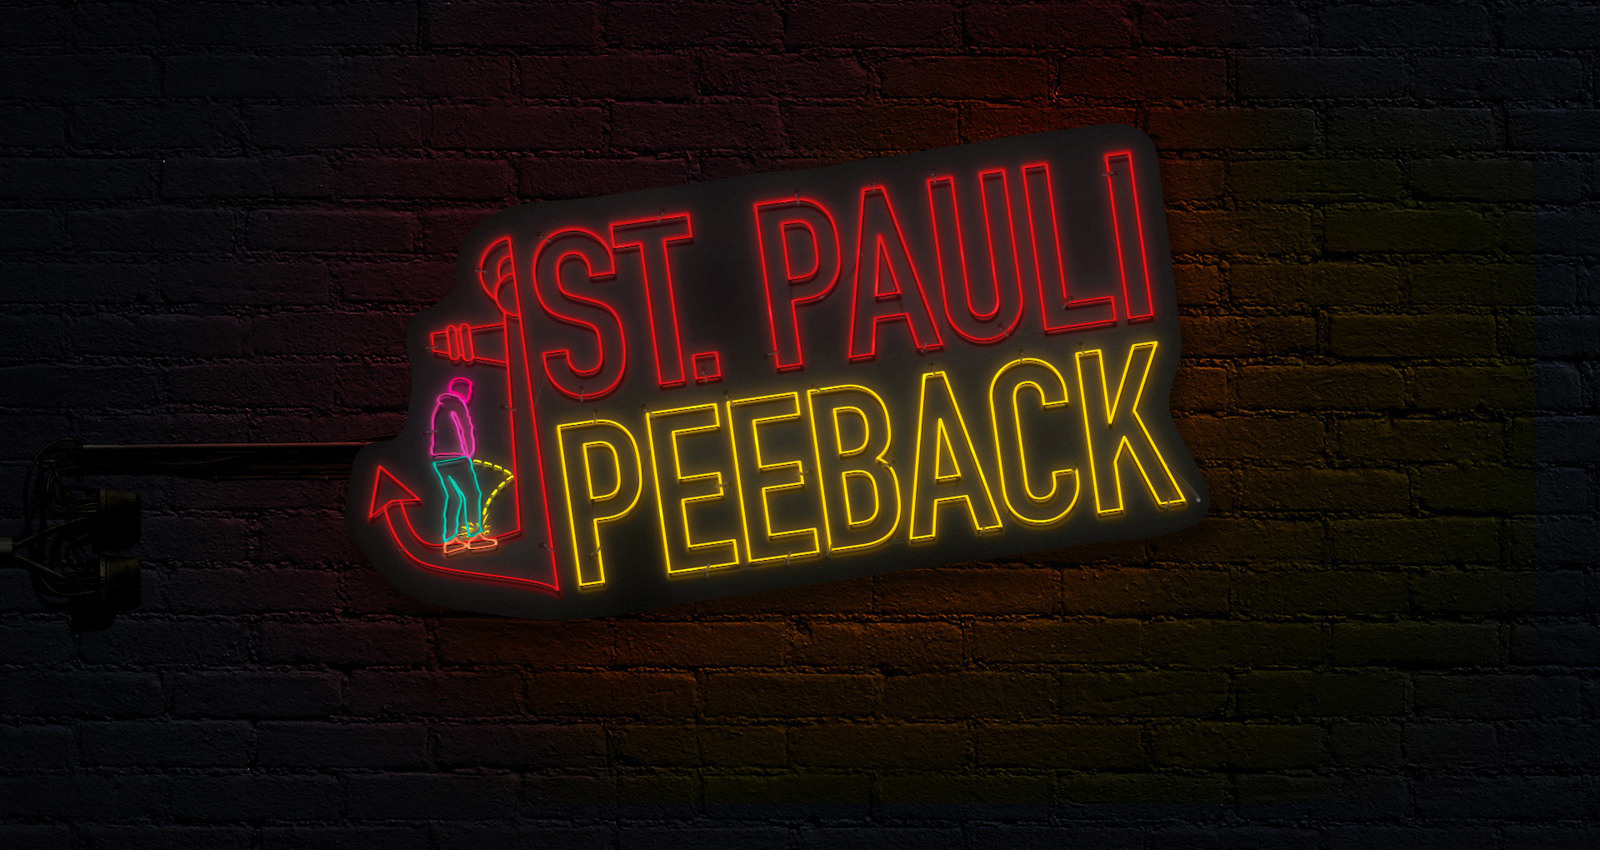 St. Pauli Peeback